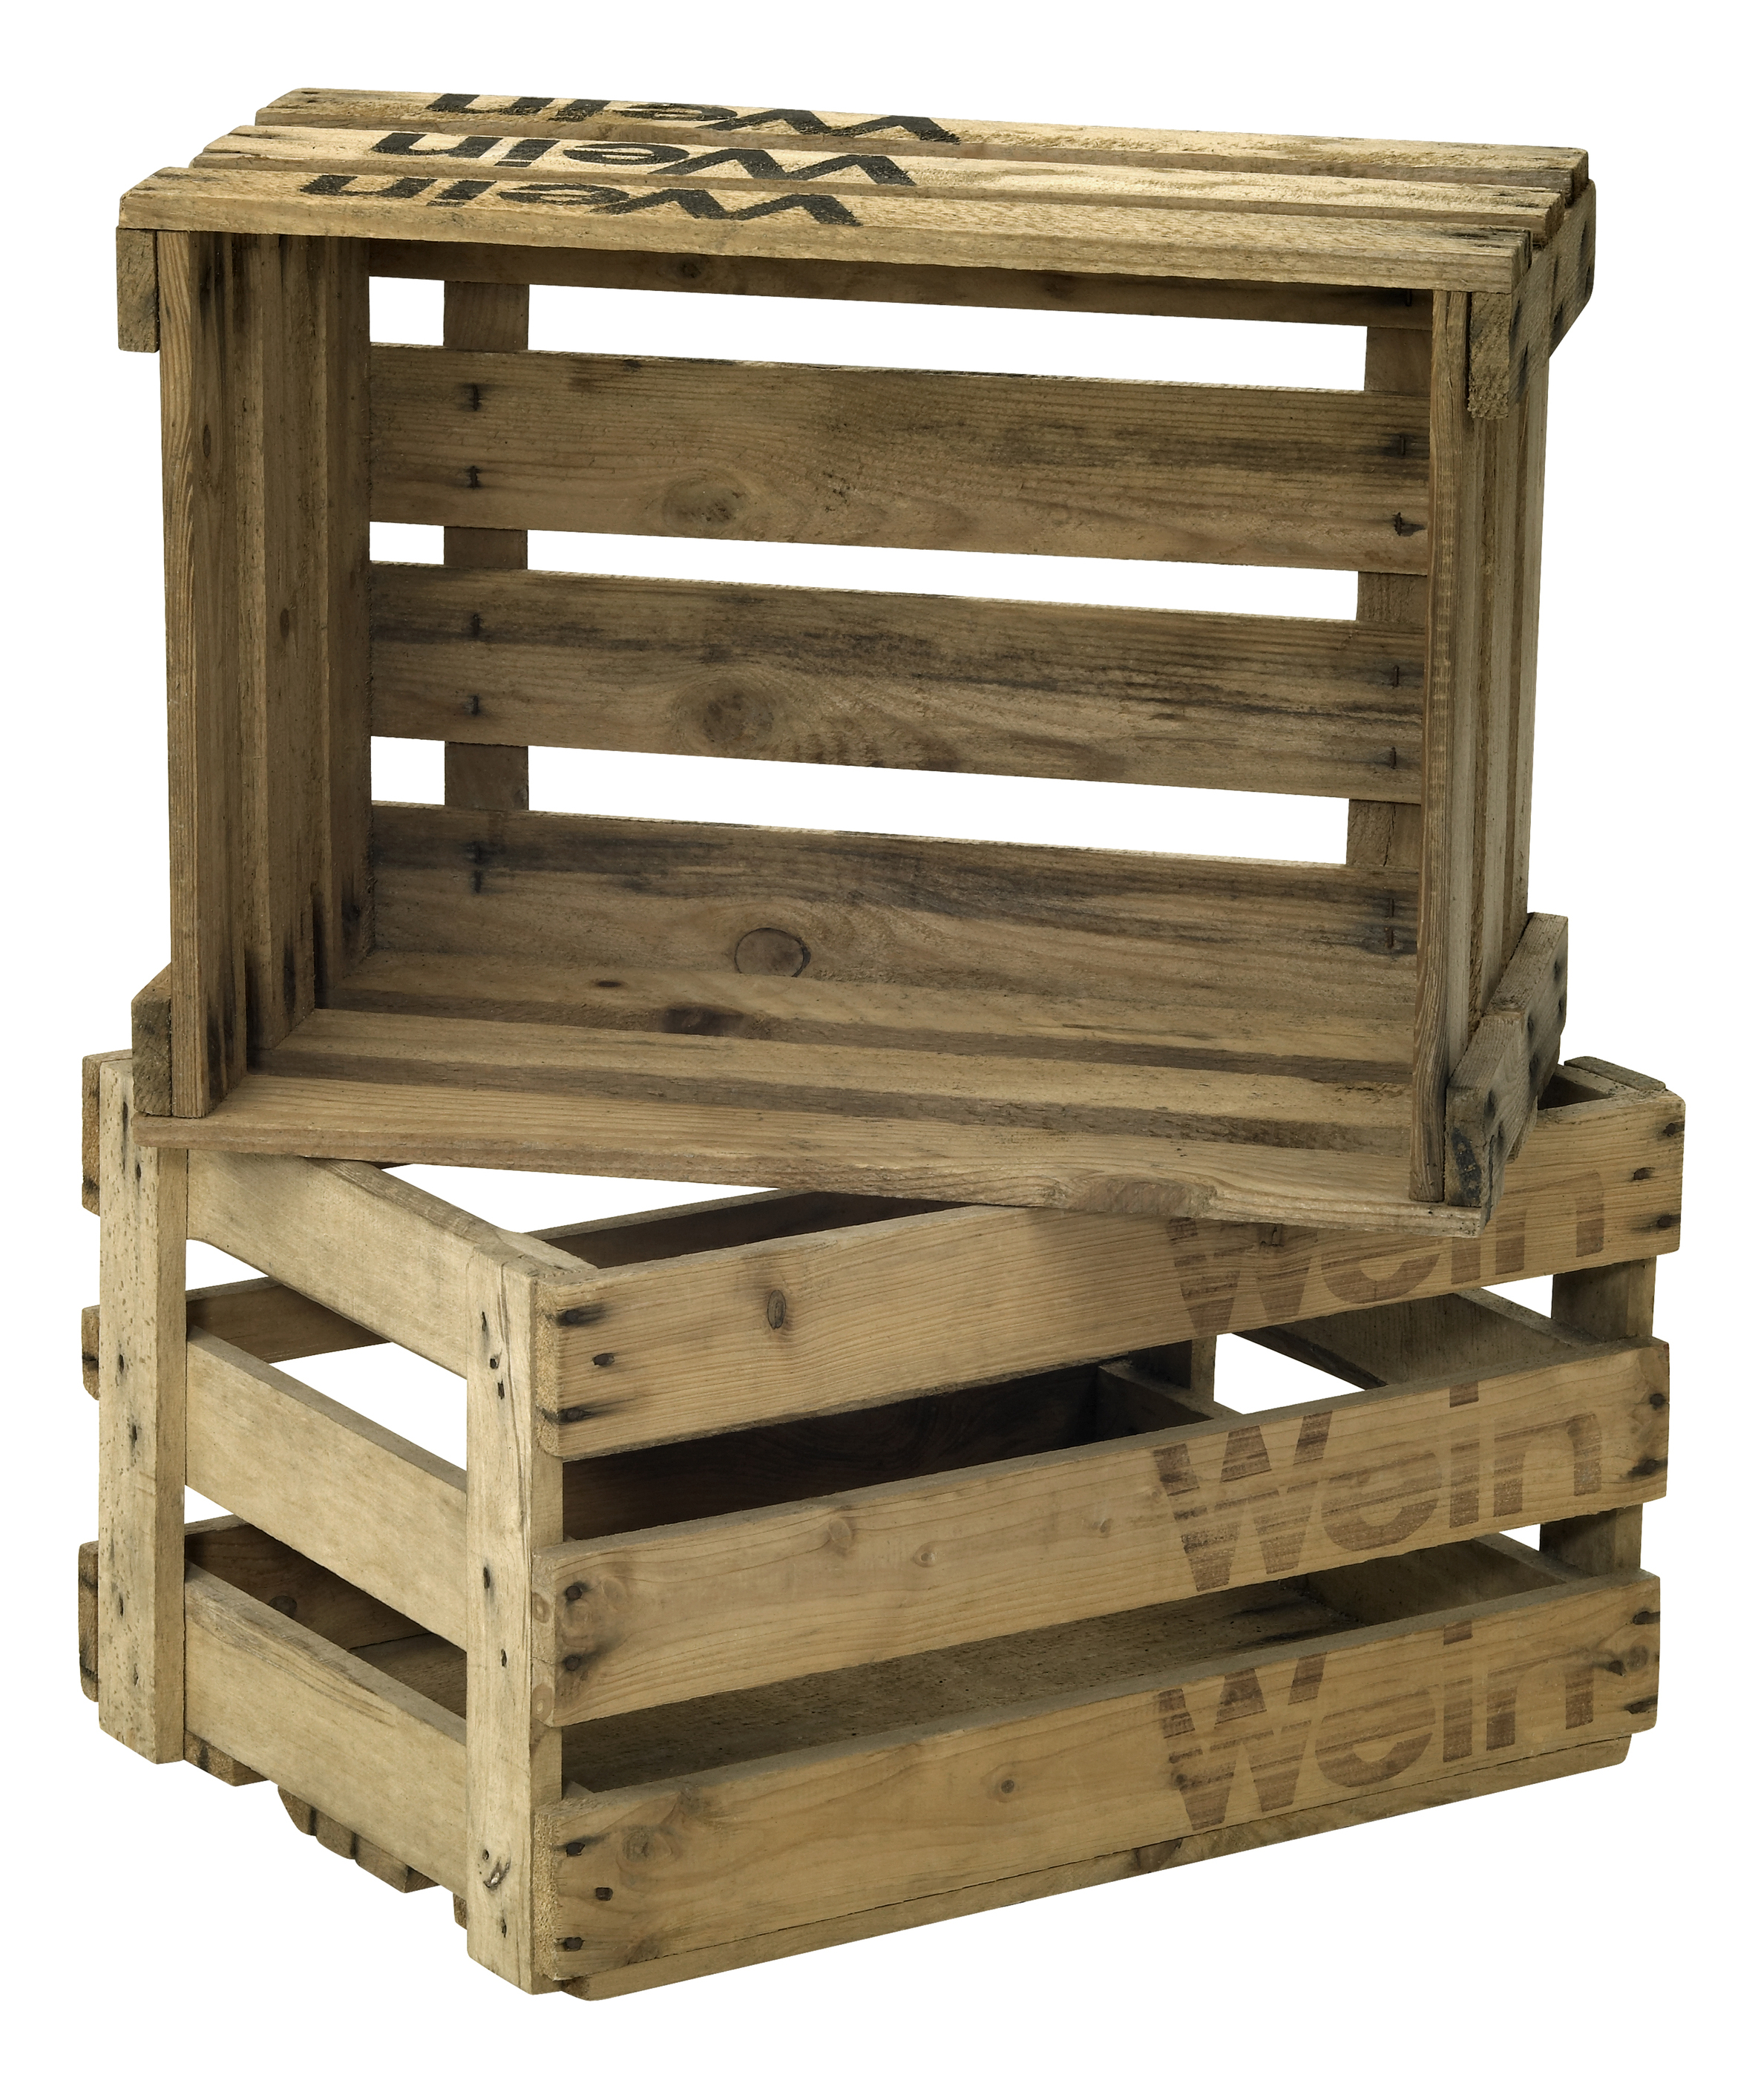 Crate Storage Room